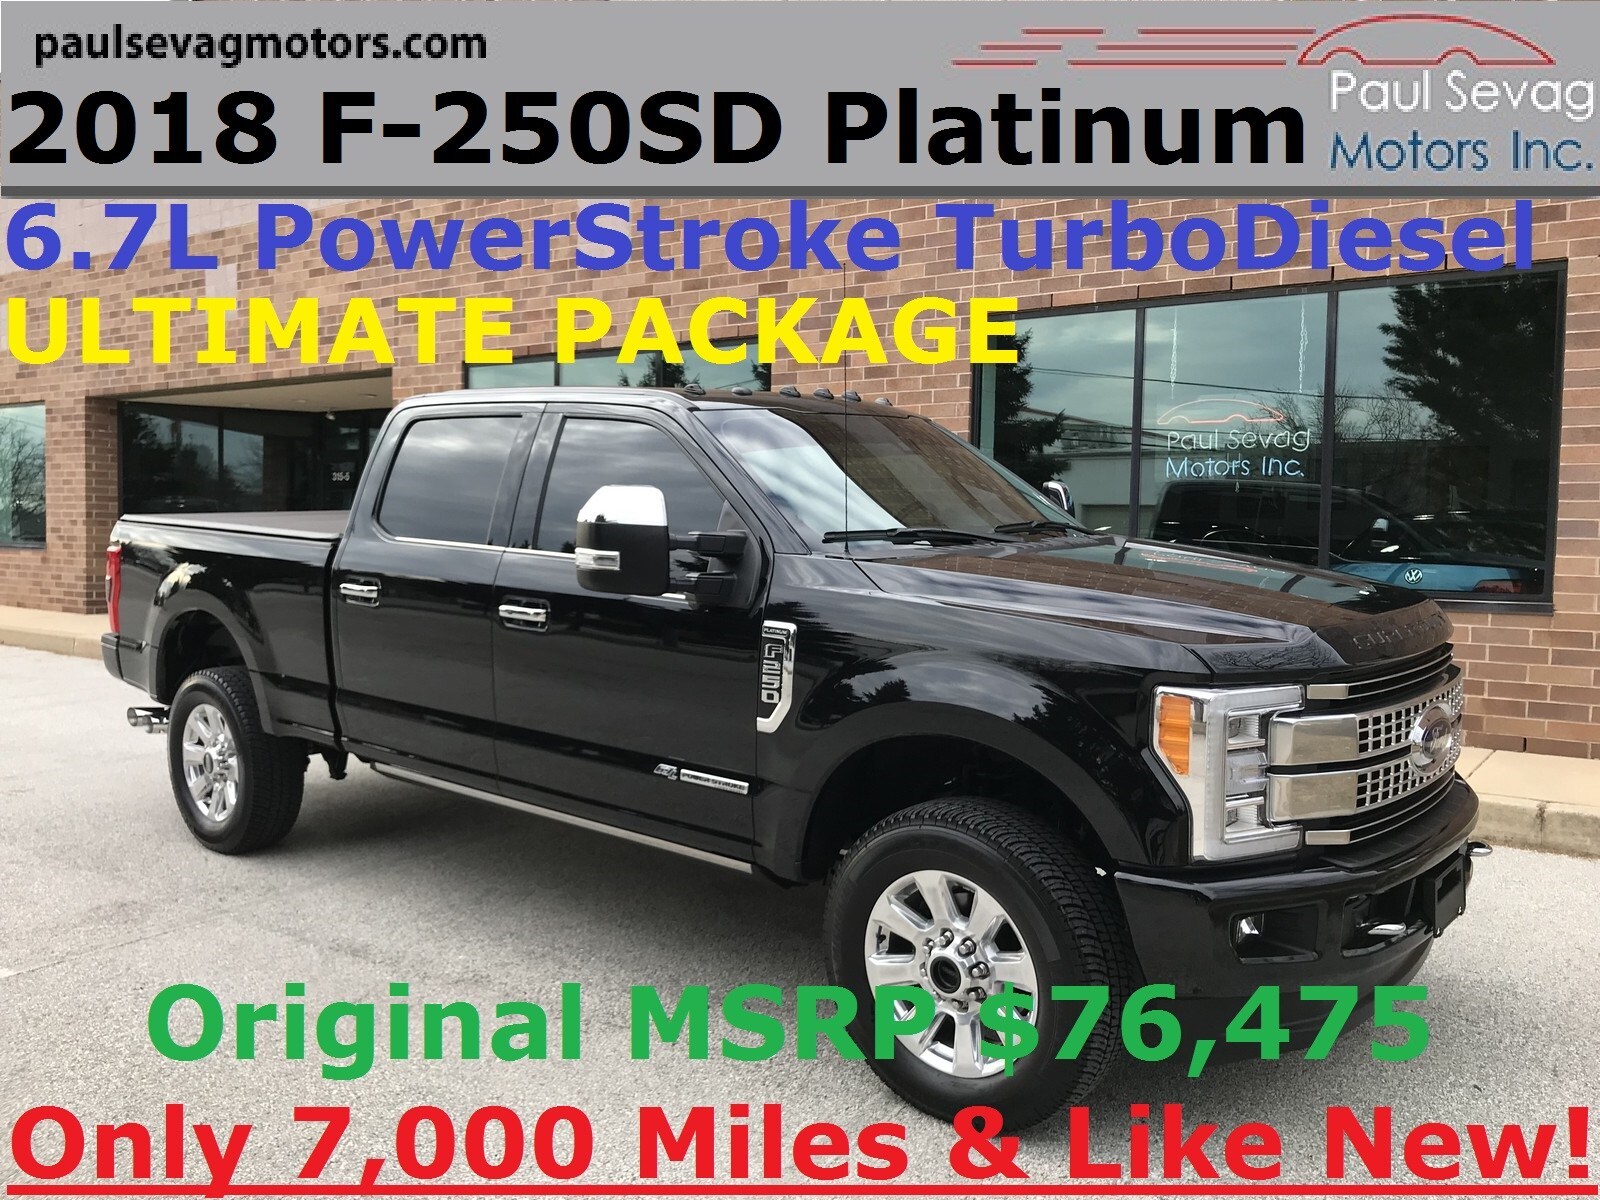 2018 Ford F-250 Super Duty Platinum Ultimate Pkg 4x4 Powerstroke Diesel Crew Cab